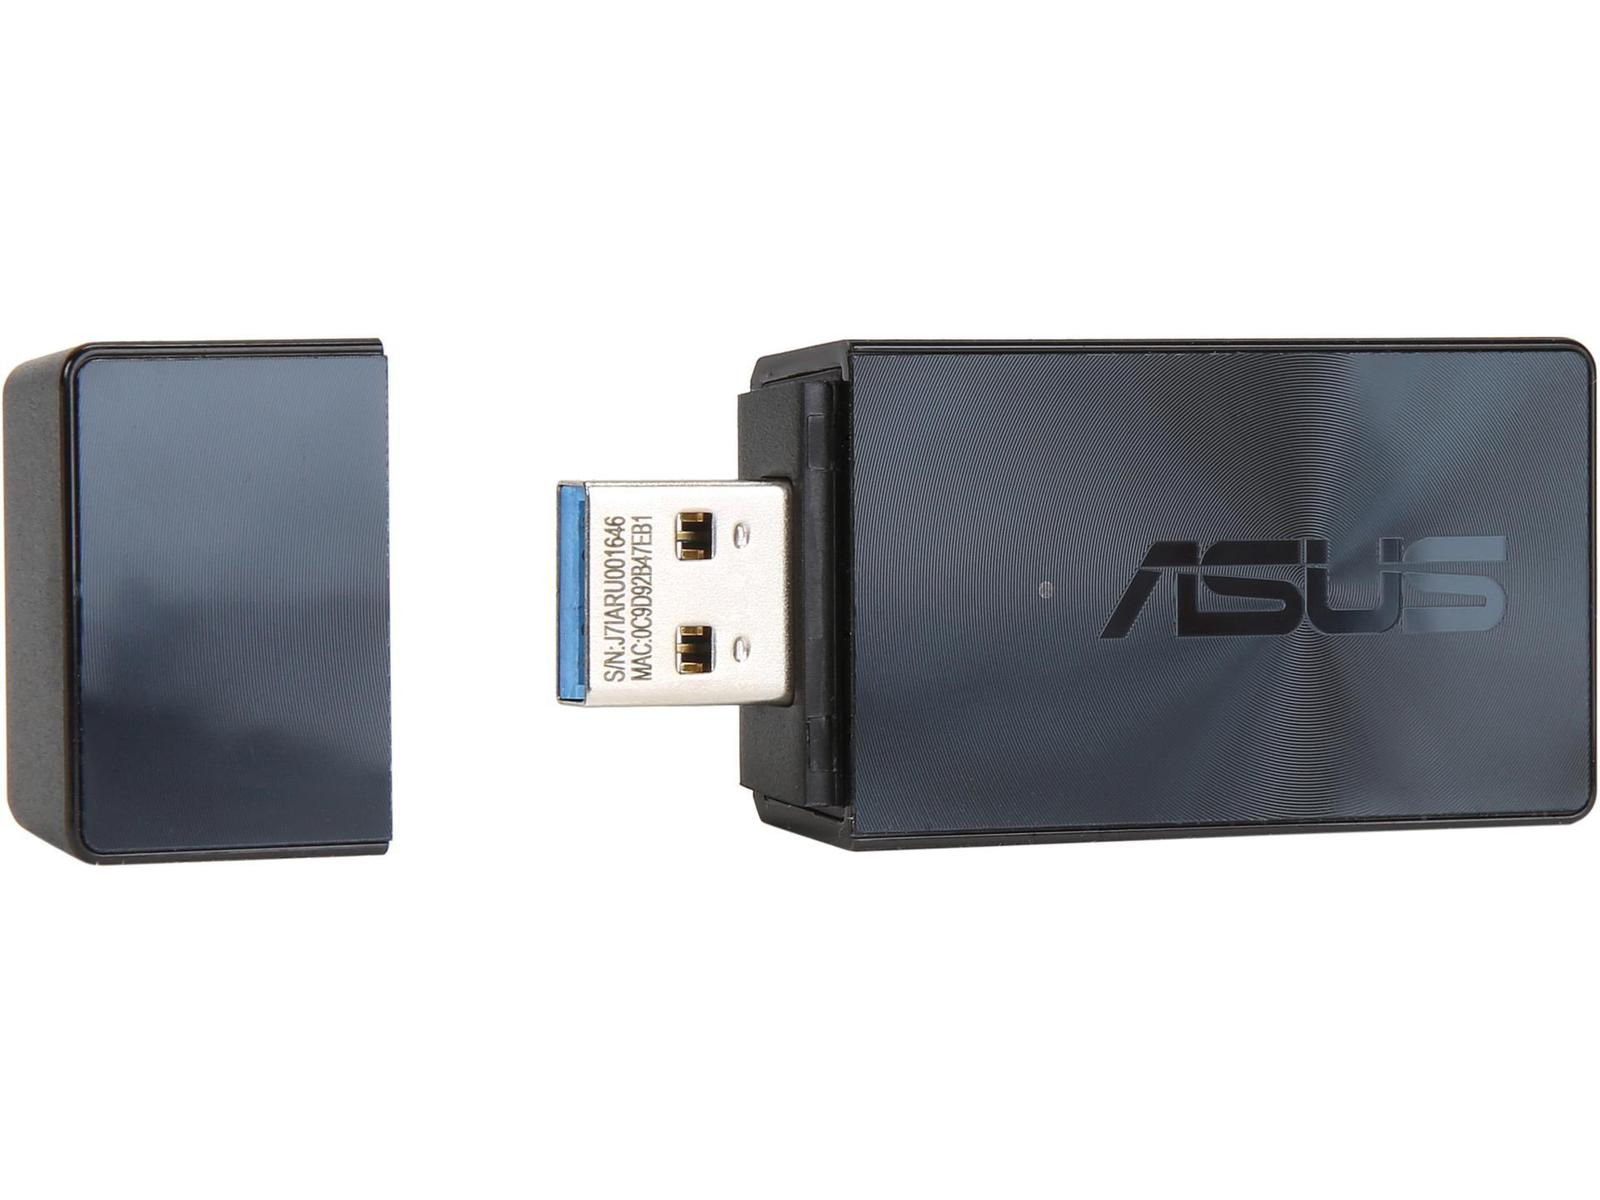 Asus USB-AC55 B1 USB 3.0 802.11a/b/g/n/ac Wi-Fi Adapter